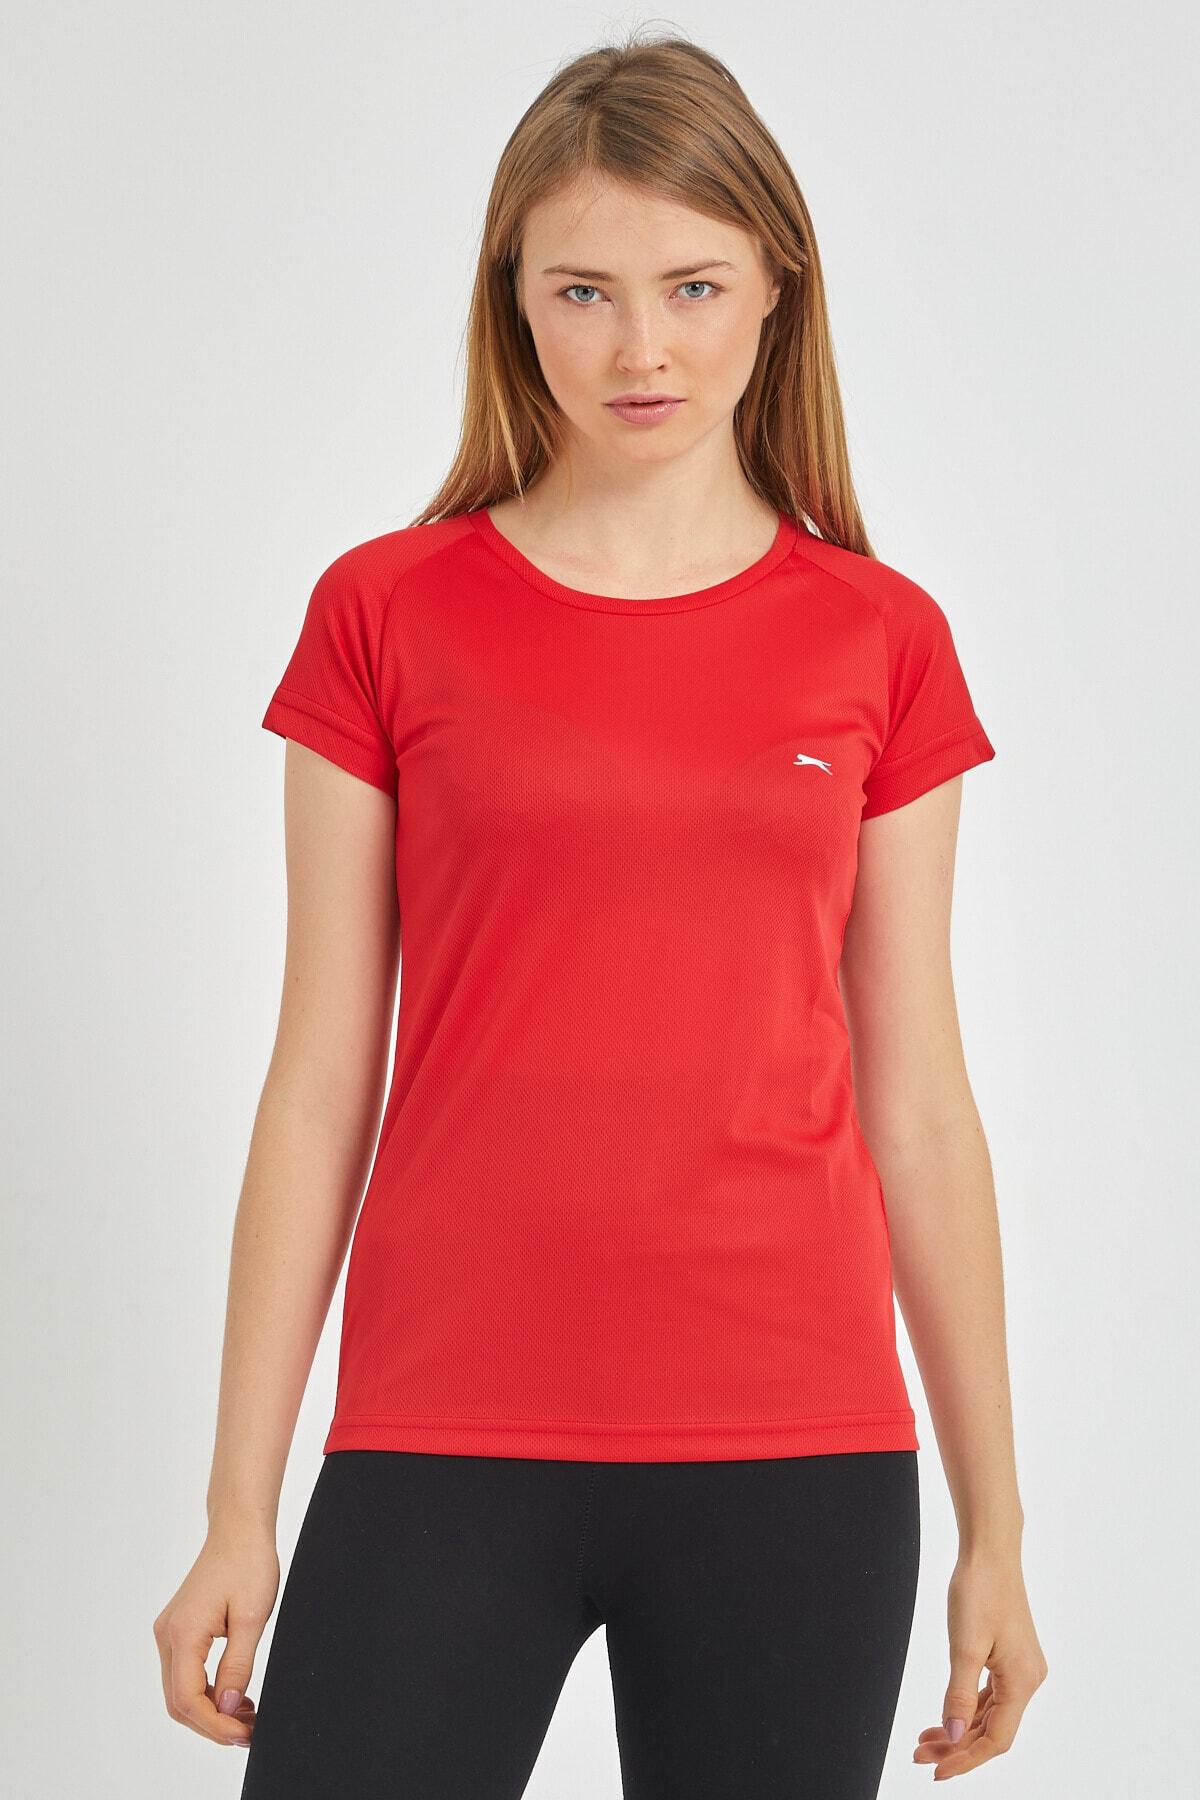 Relax Kadın T-shirt Kırmızı St11te050